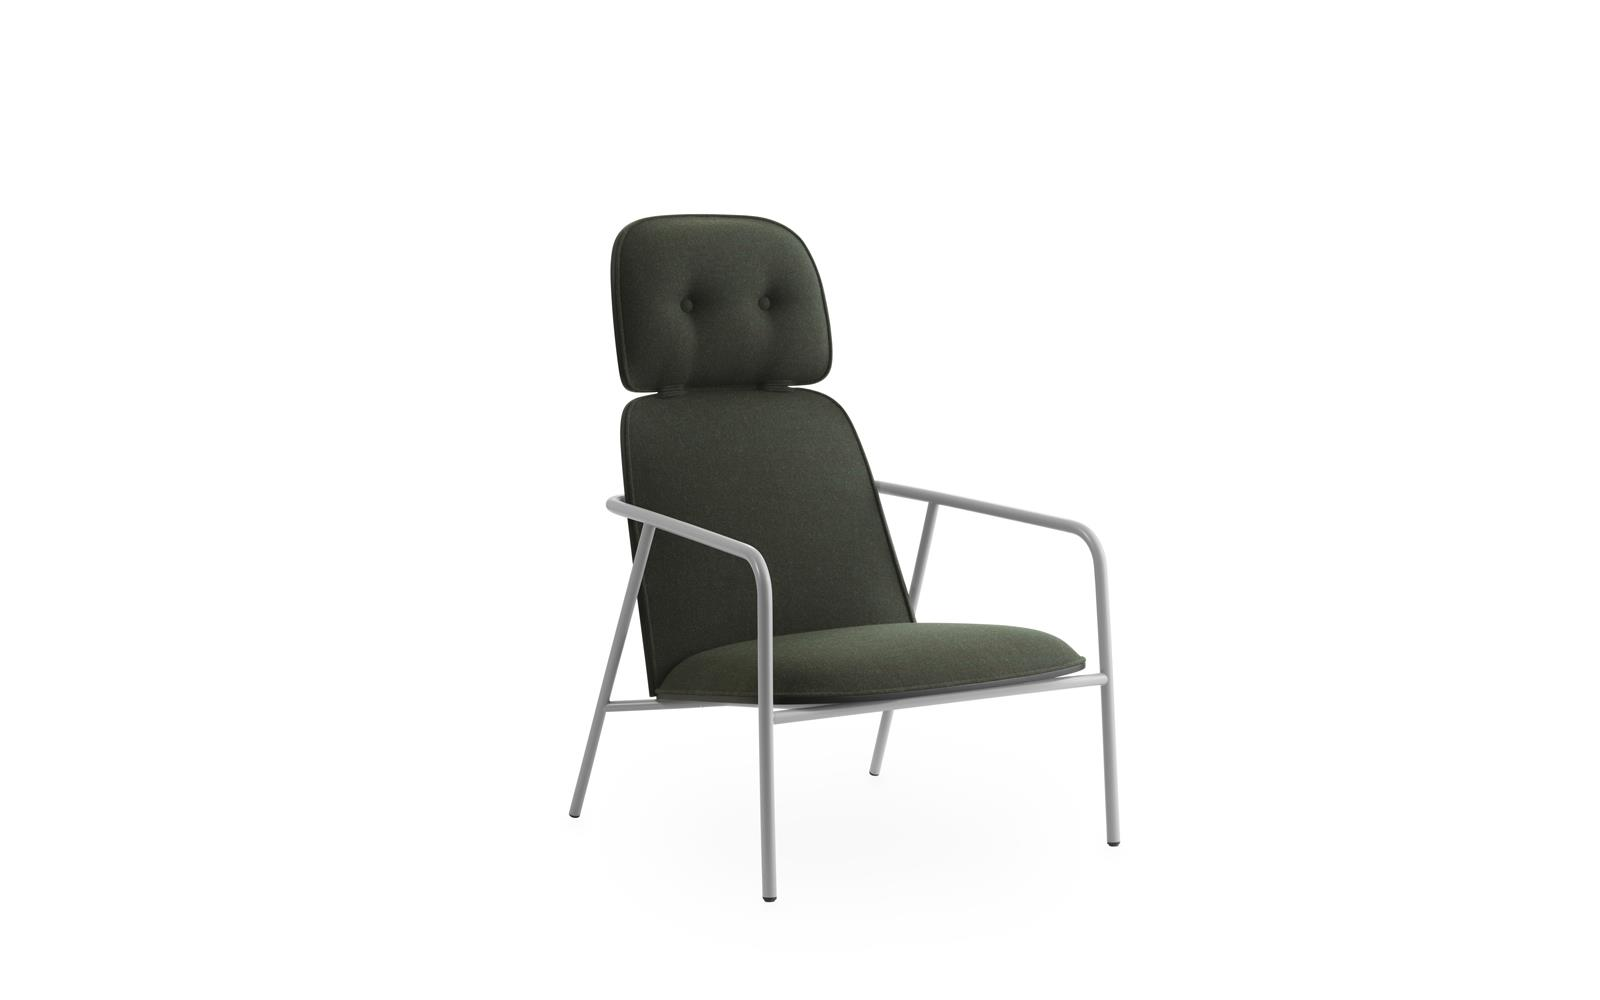 steel lounge chair ez hang pad high grey black synergy steel1